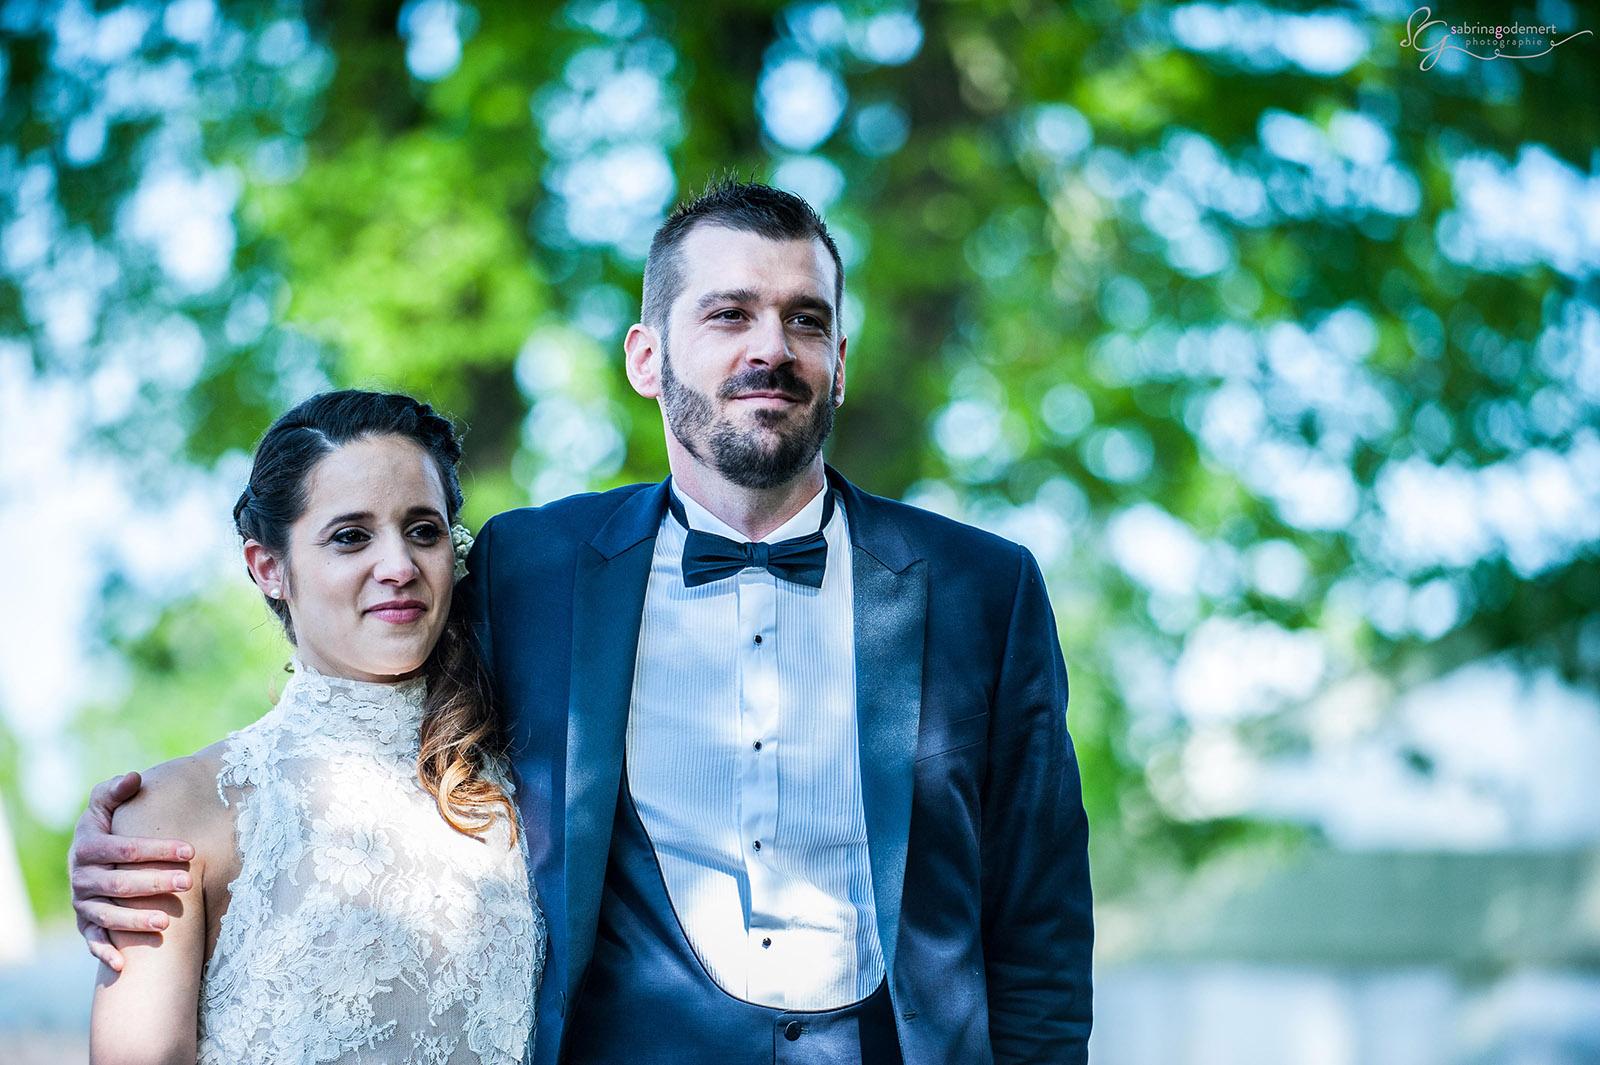 Mariage Soraya et Julien - Sabrina Godemert photographe-209